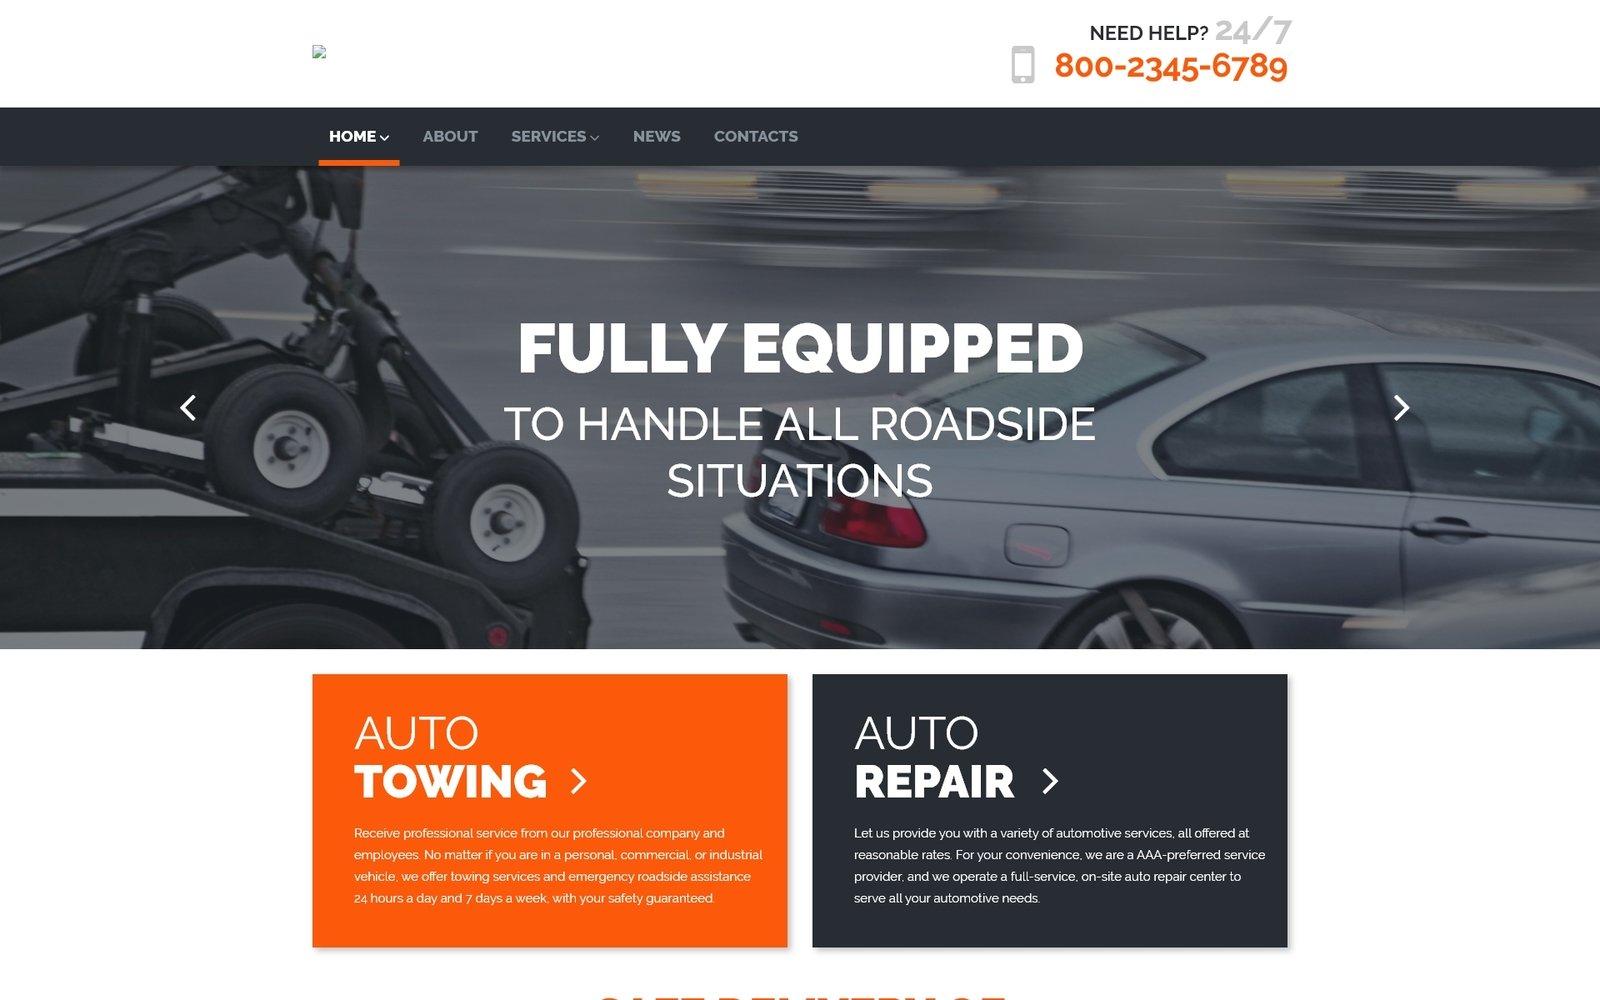 Адаптивный шаблон сайта на тему буксировка авто #58528